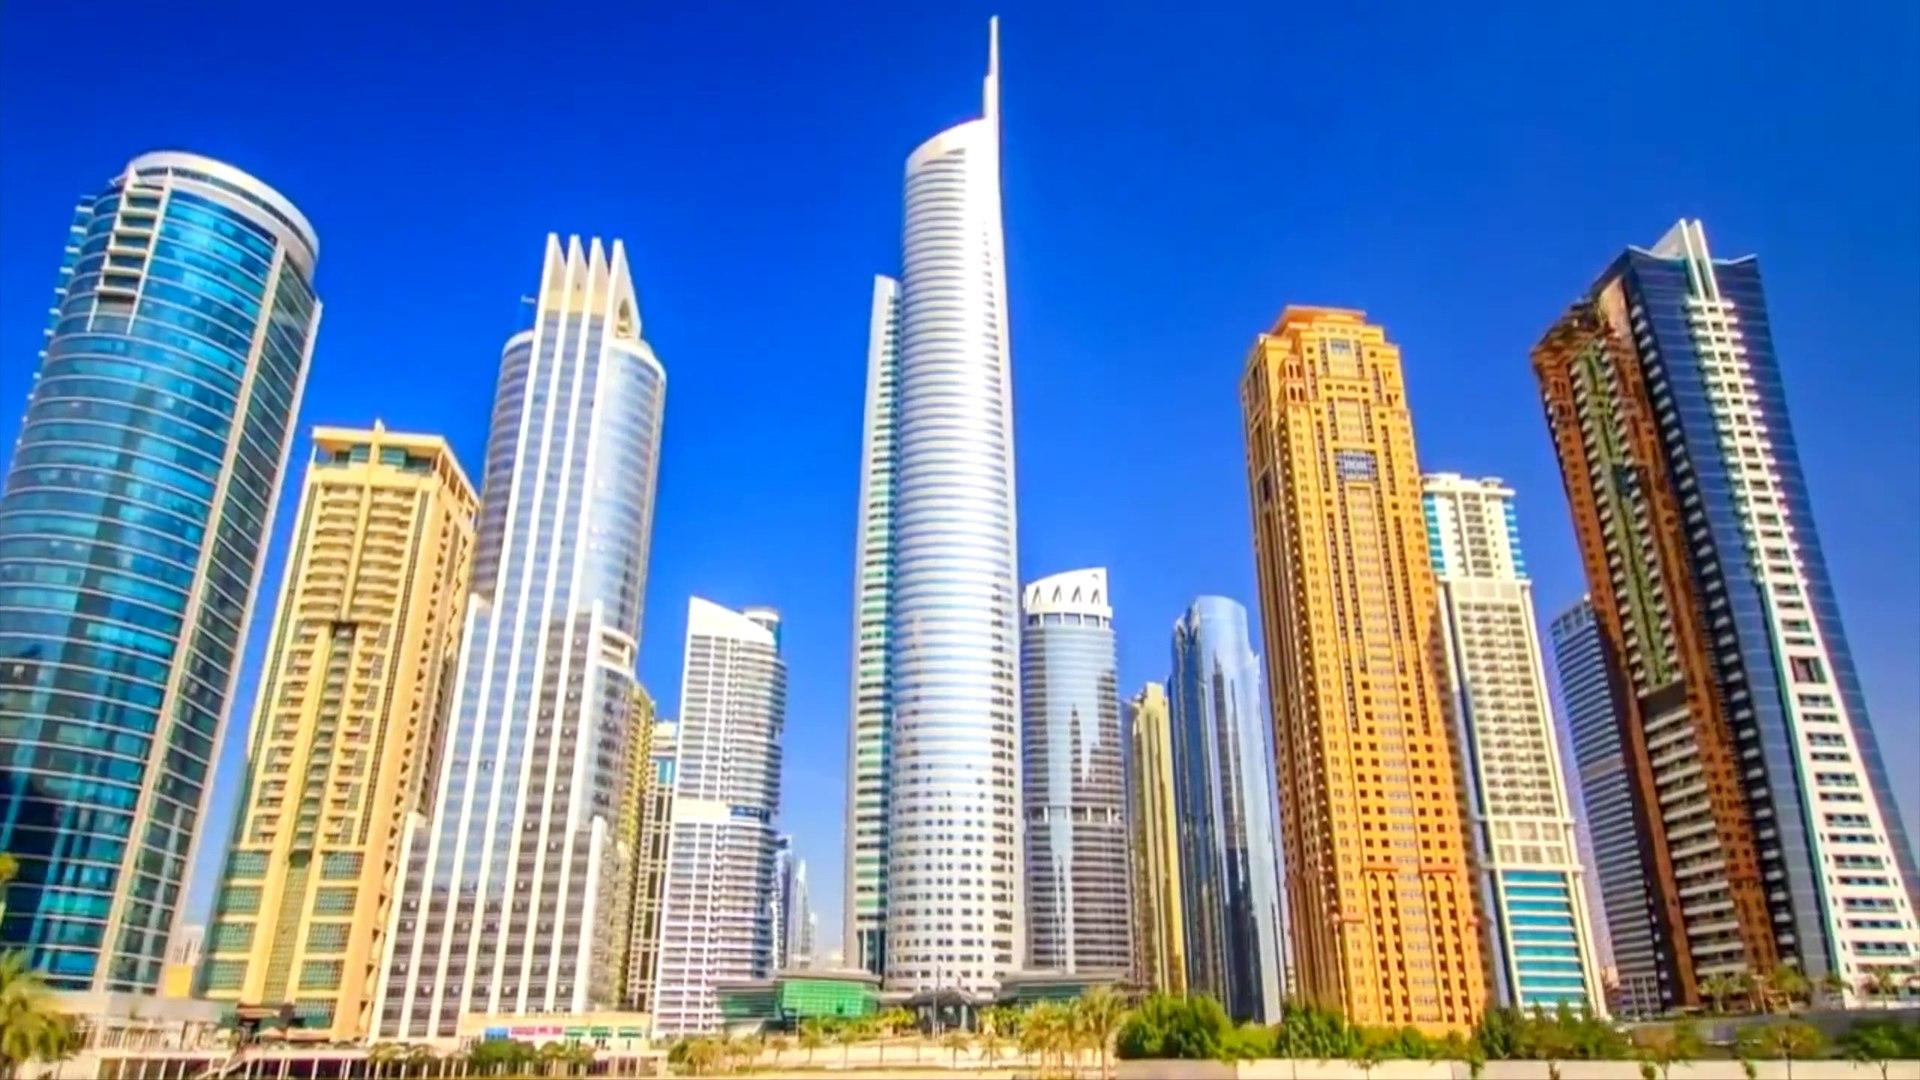 Dubai - UAE Travel Tour | Dubai In UHD 4K